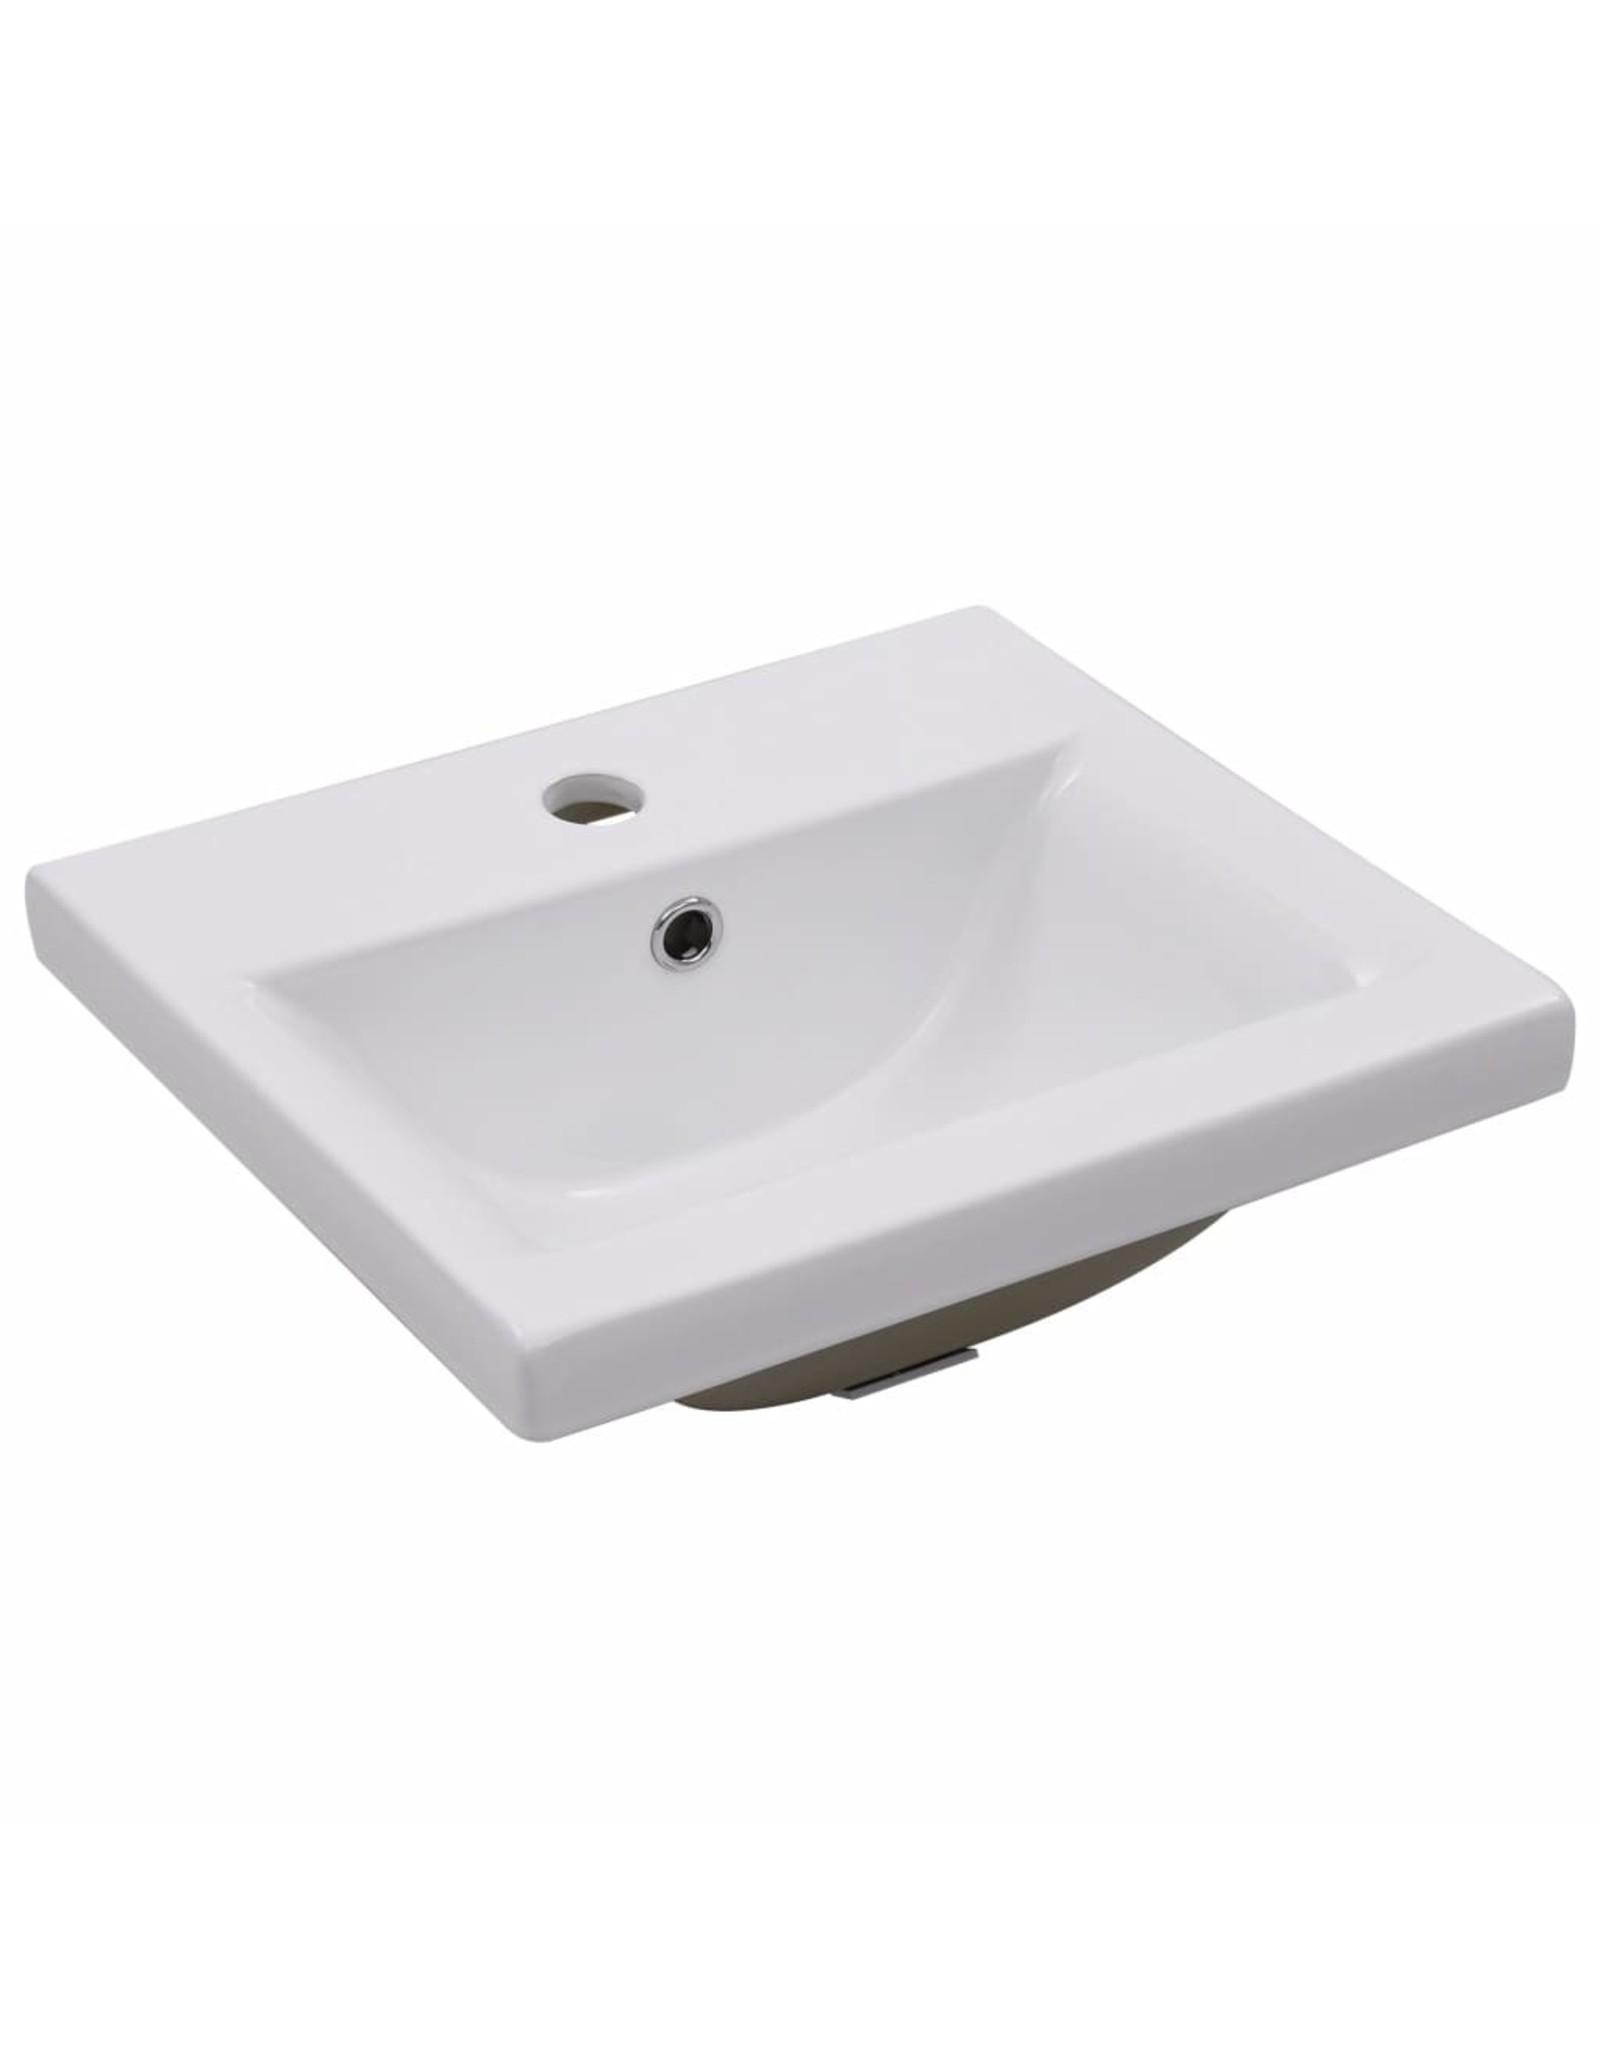 Inbouwwastafel 42x39x18 cm keramiek wit